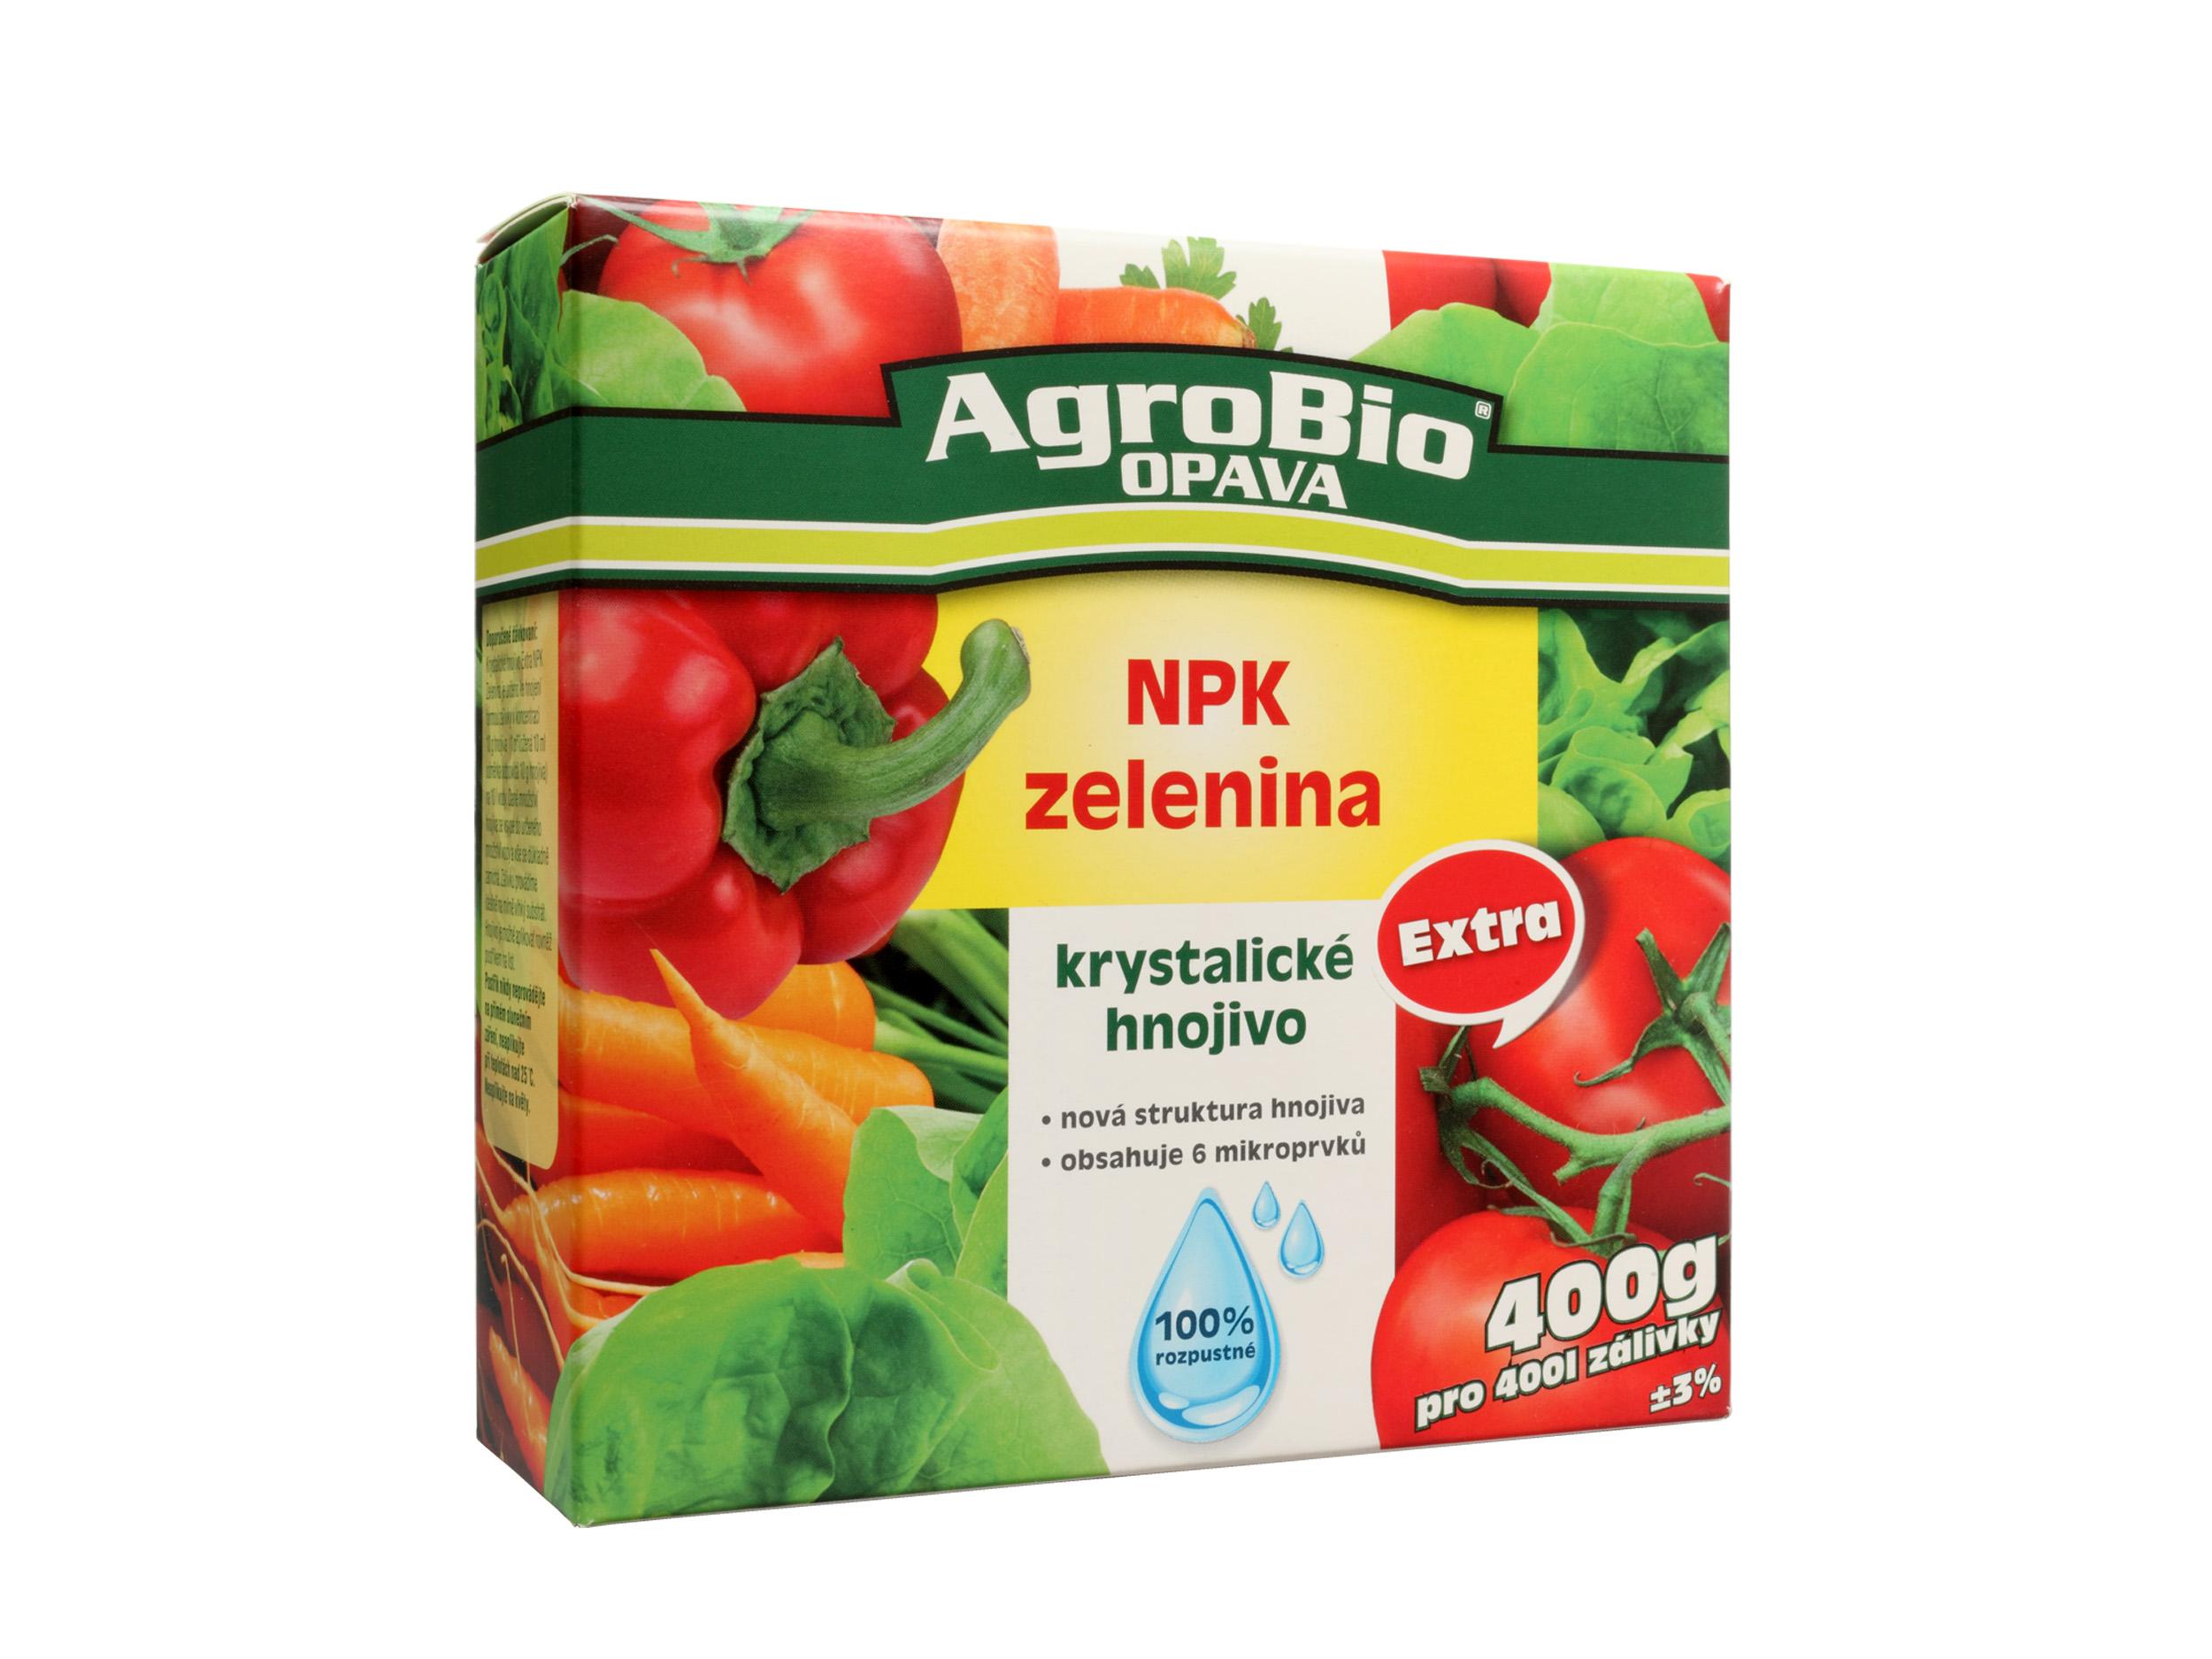 Krystalické hnojivo Extra NPK Zelenina